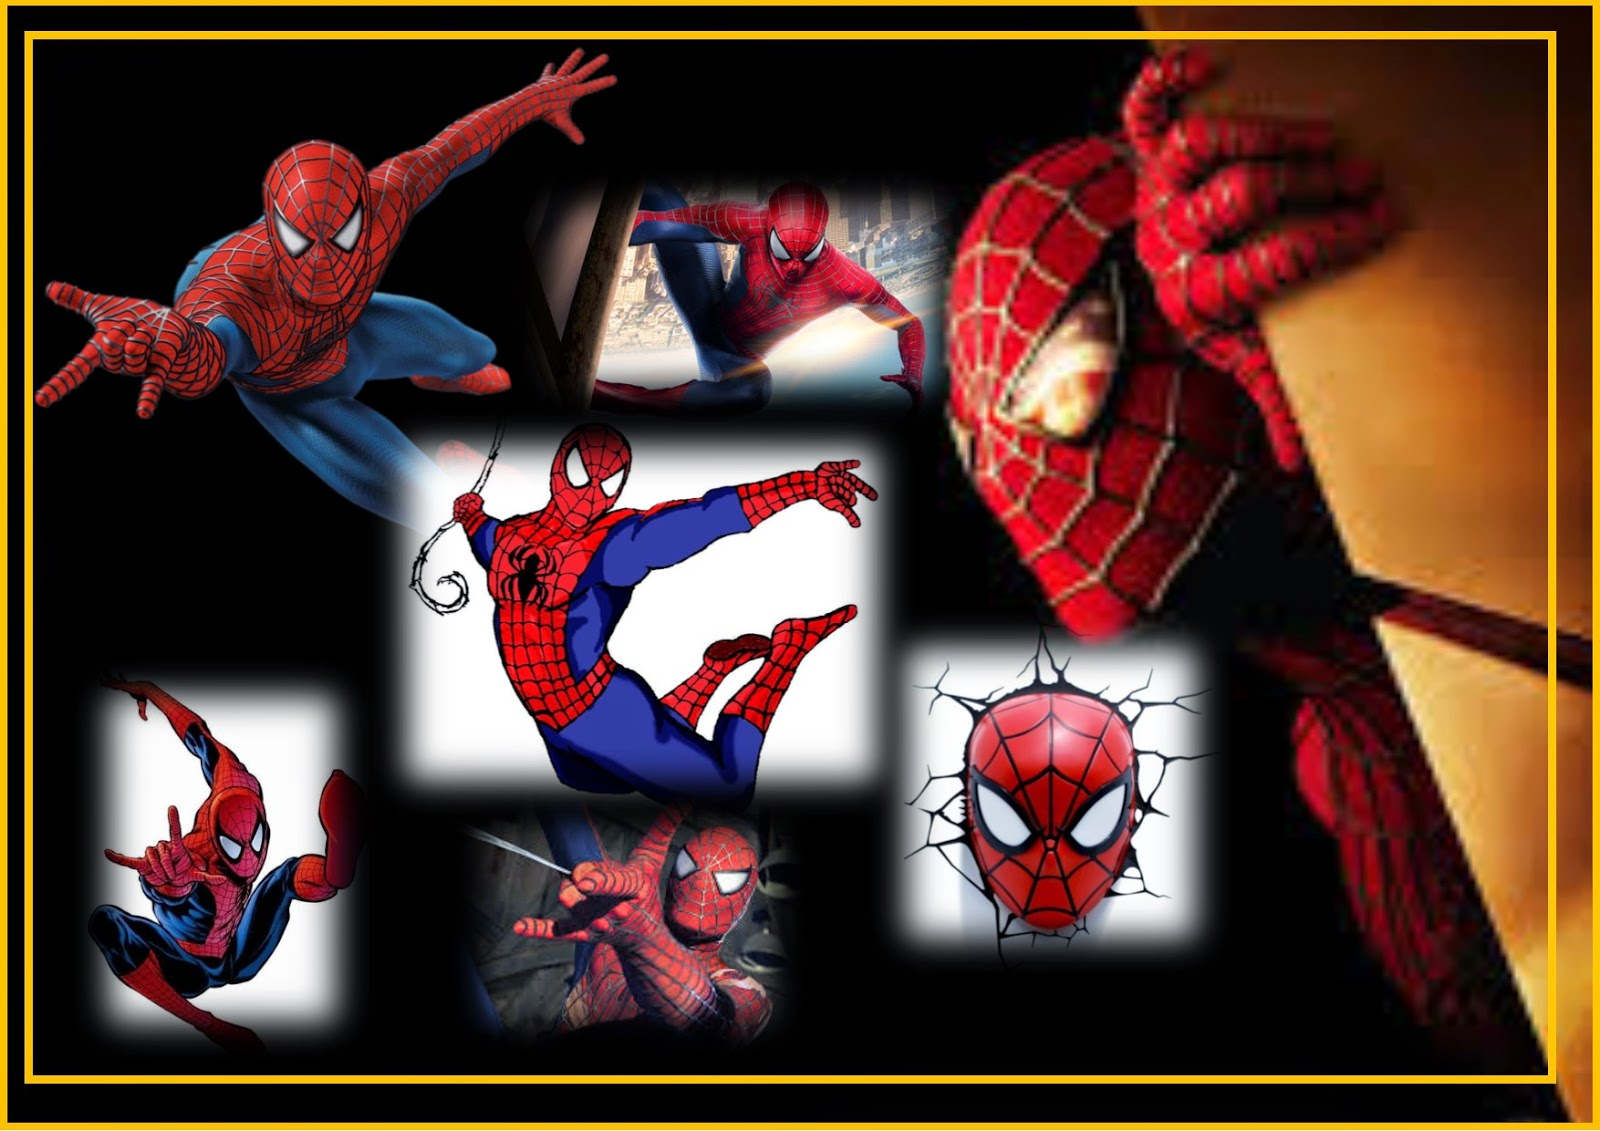 sensational spider man costume